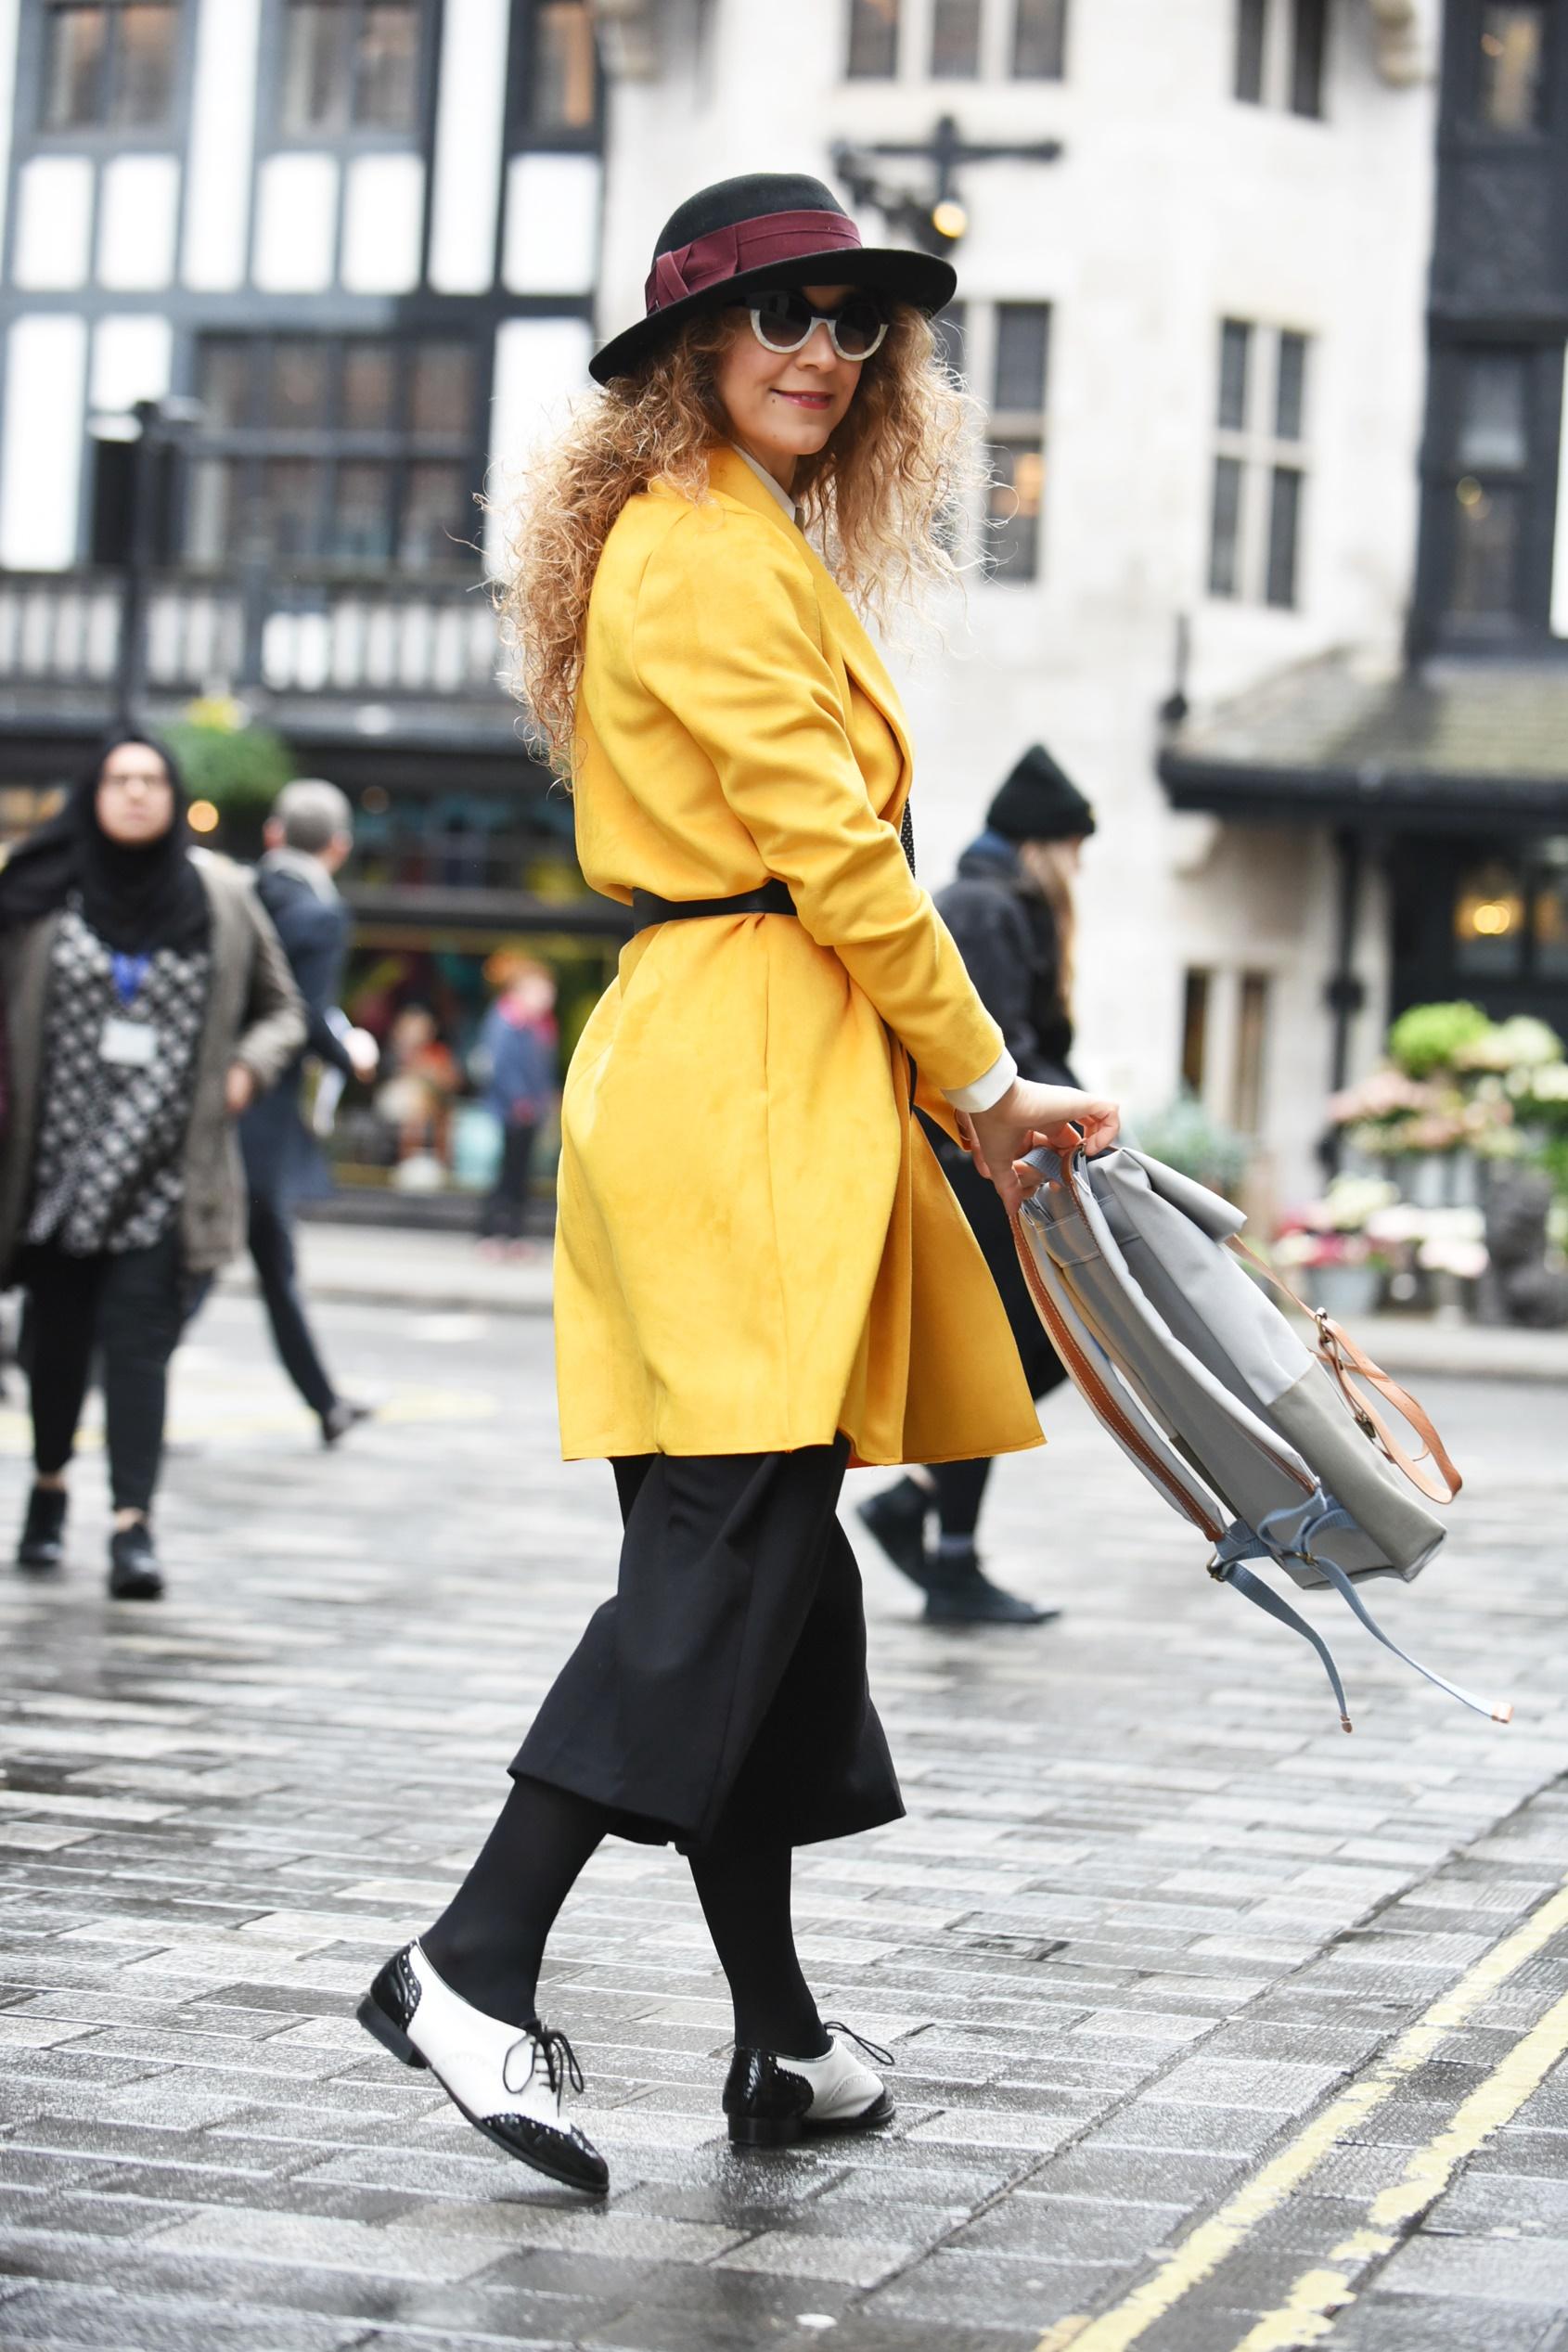 3quarters.design street style at London Fashion Week Feb2018